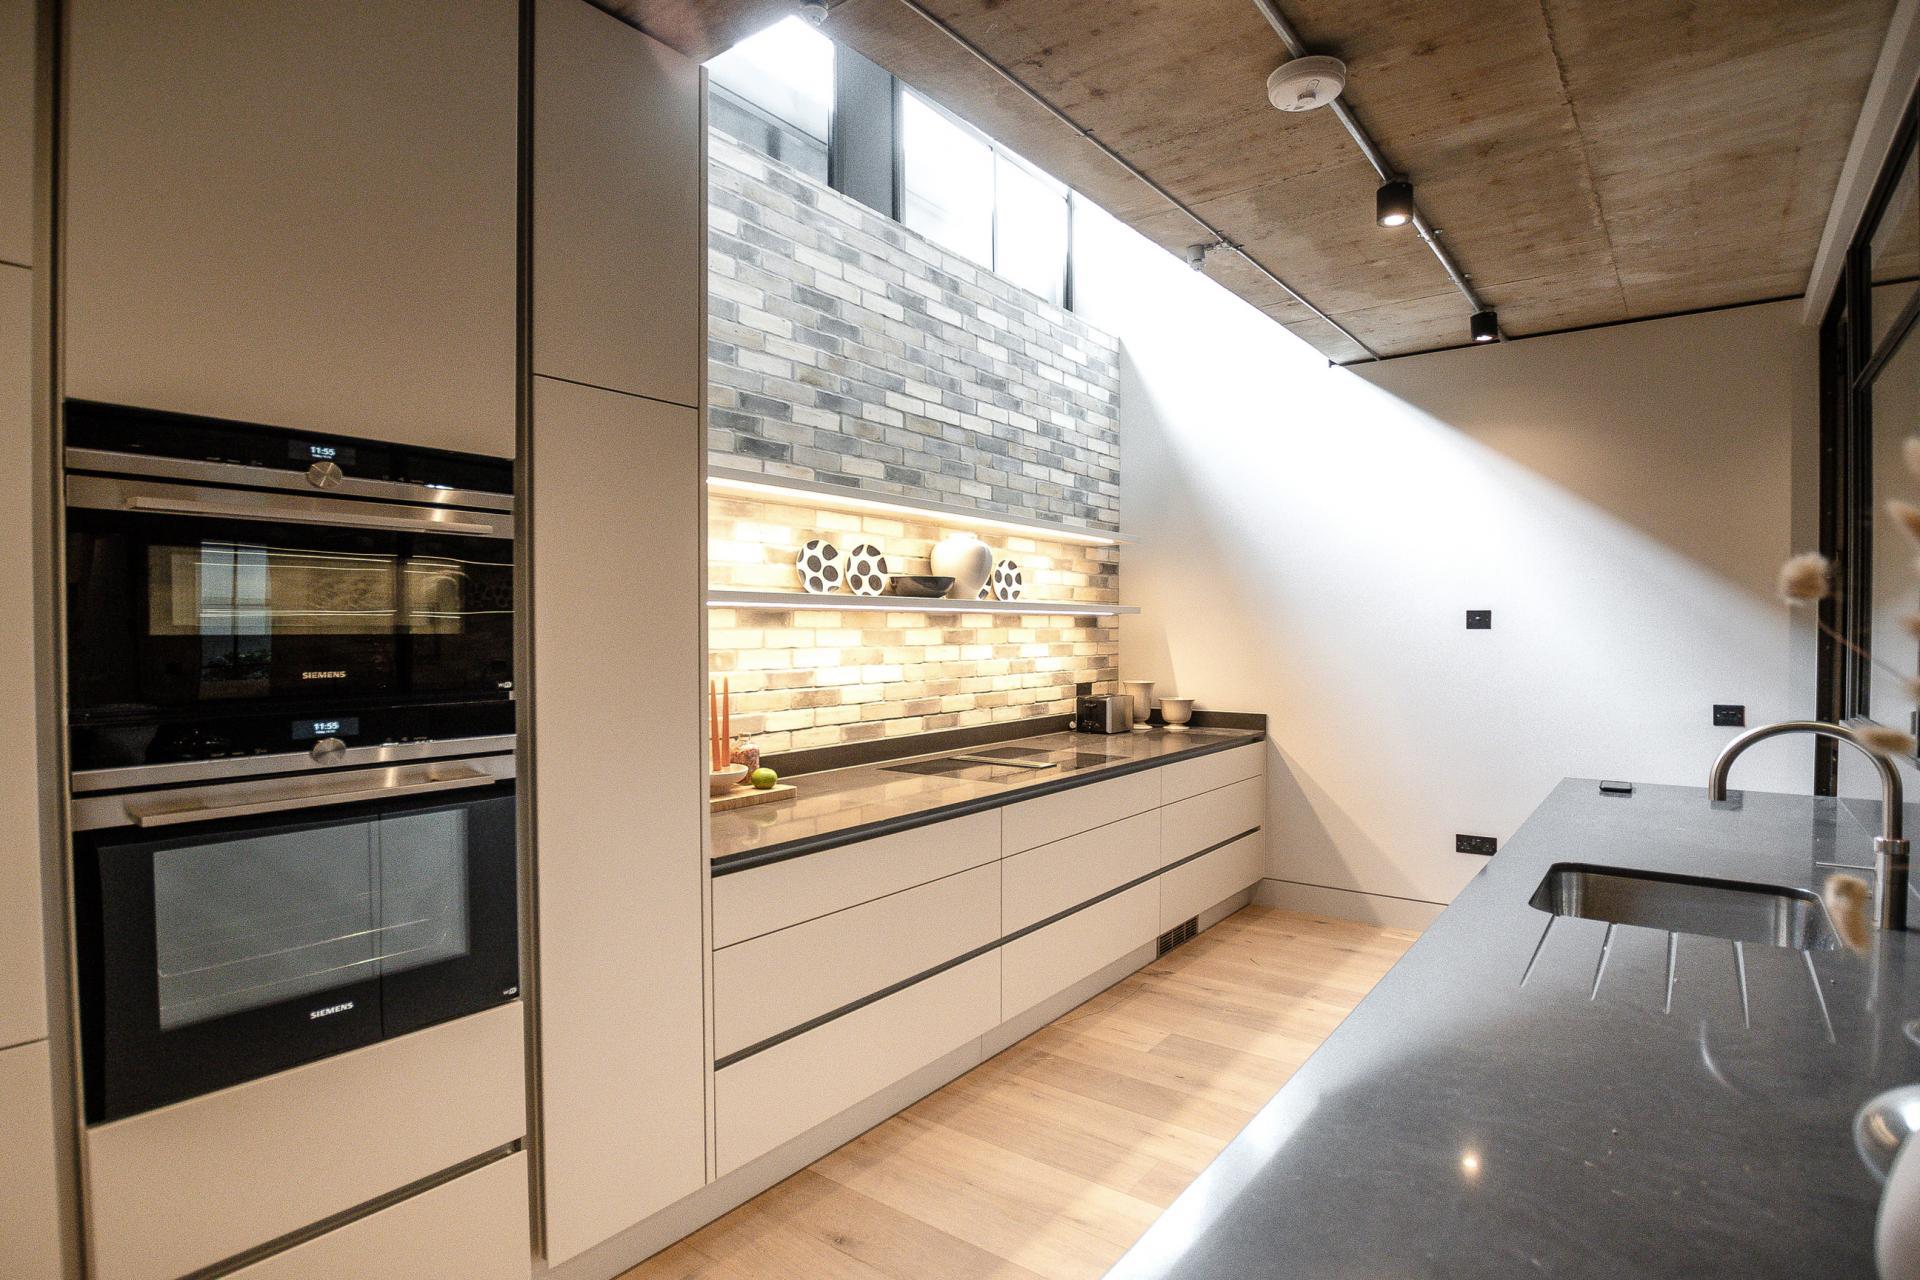 Kitchen at King's Mews Apartments, Holborn, London - Citybase Apartments